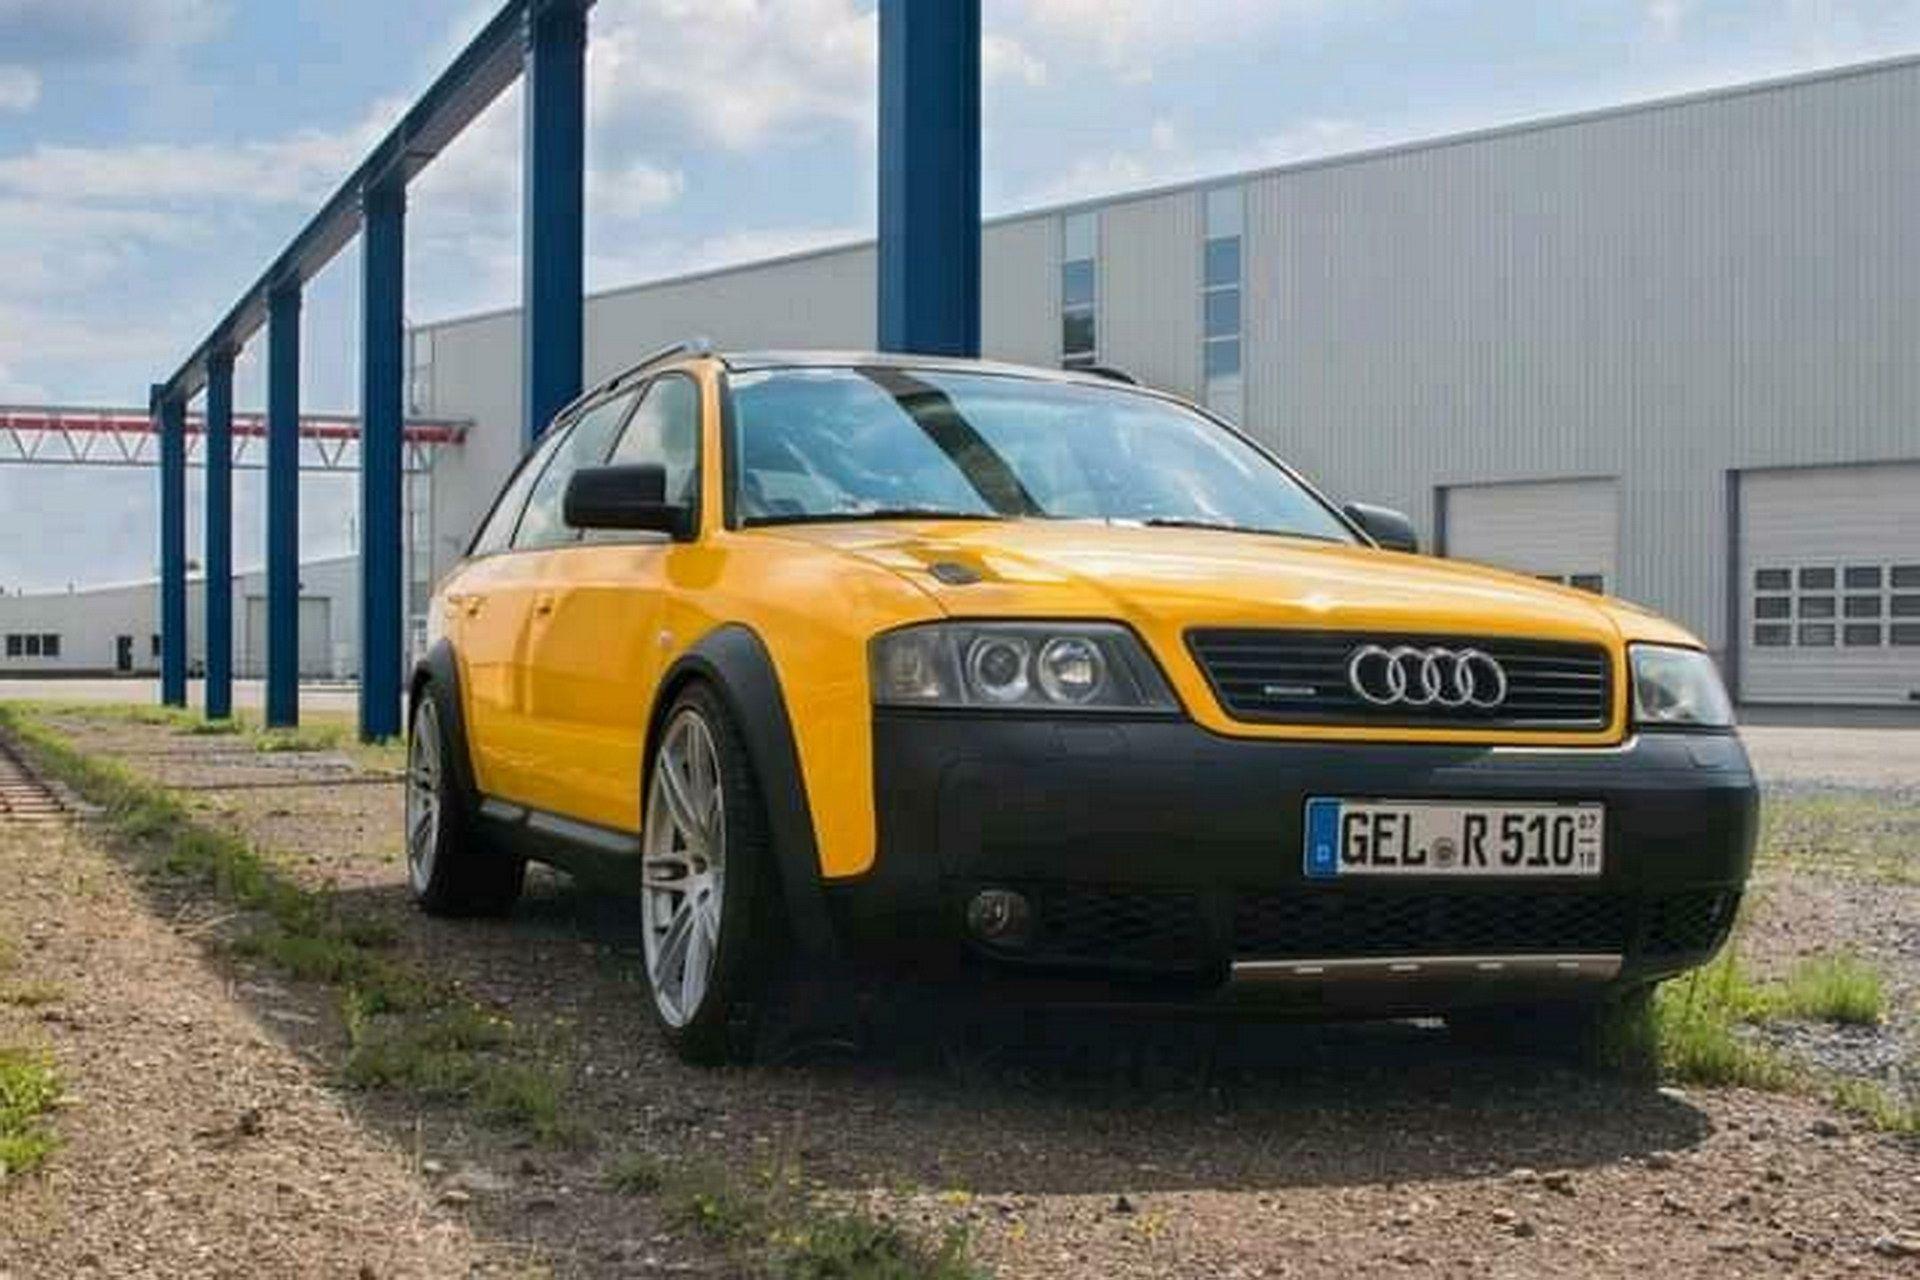 Audi-RS6-Allroad-Custom-Build-1.jpg